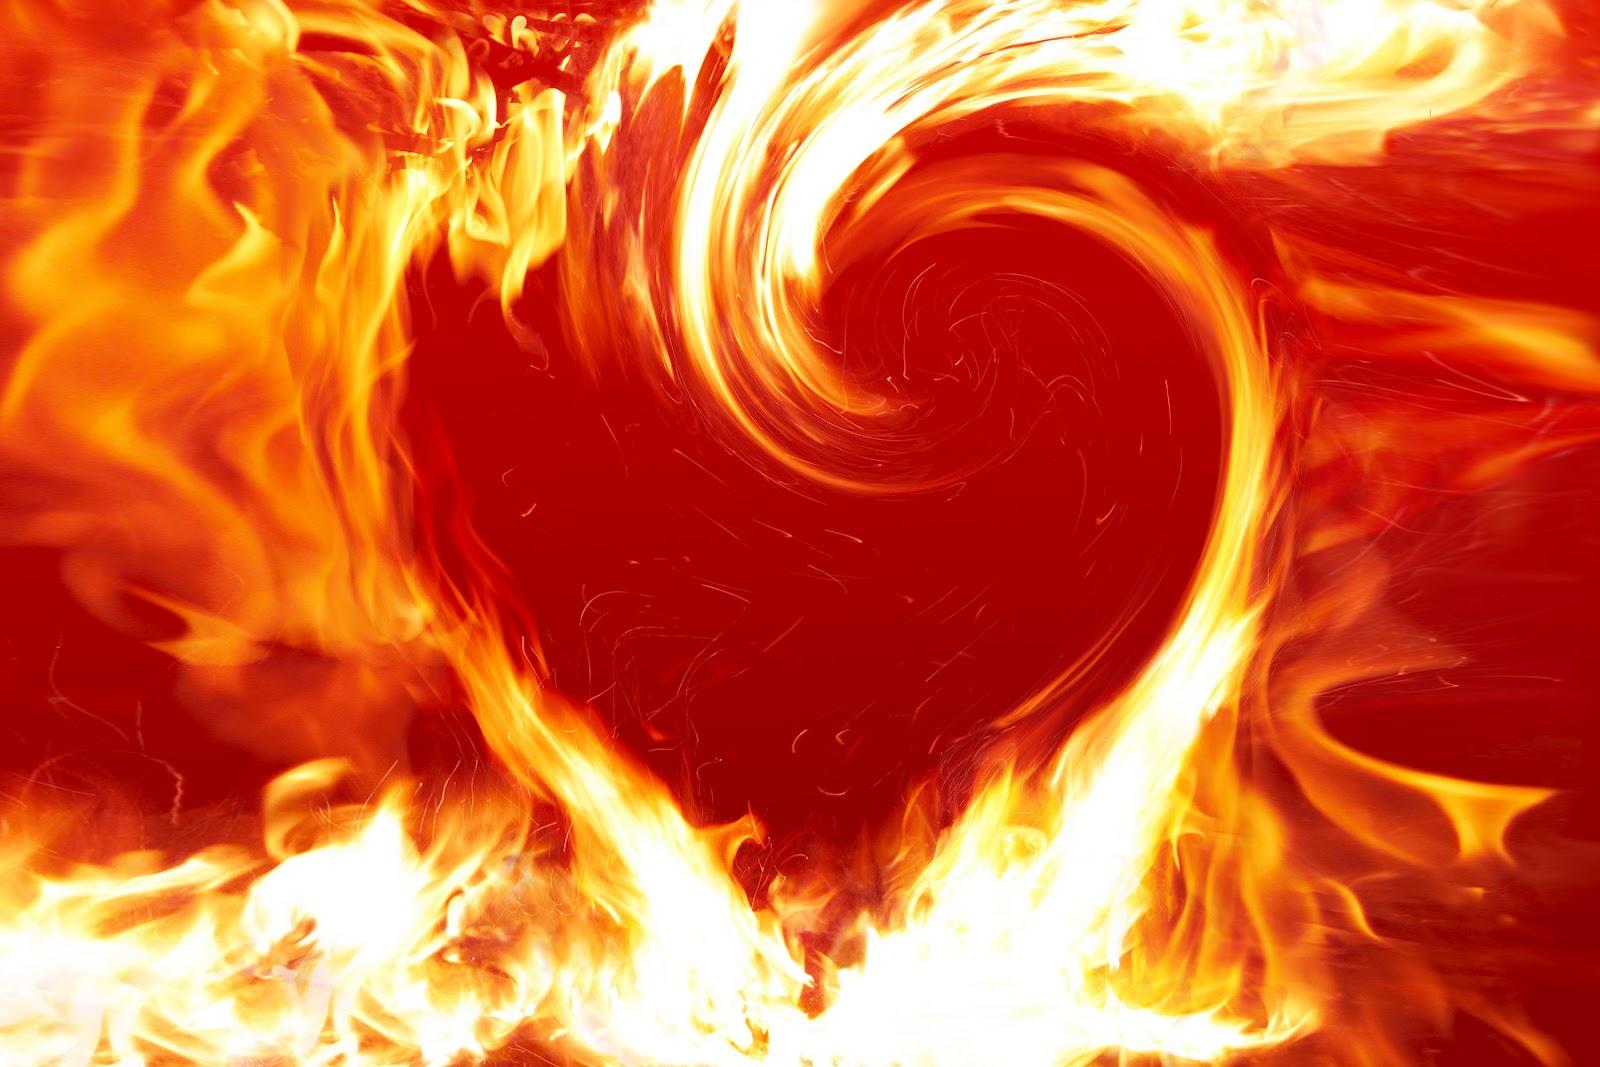 http://3.bp.blogspot.com/-PGNdAwFbnhE/TzI2OL6NE8I/AAAAAAAAACA/axtjDXyDuSI/s1600/broken-heart-wallpaper.jpg